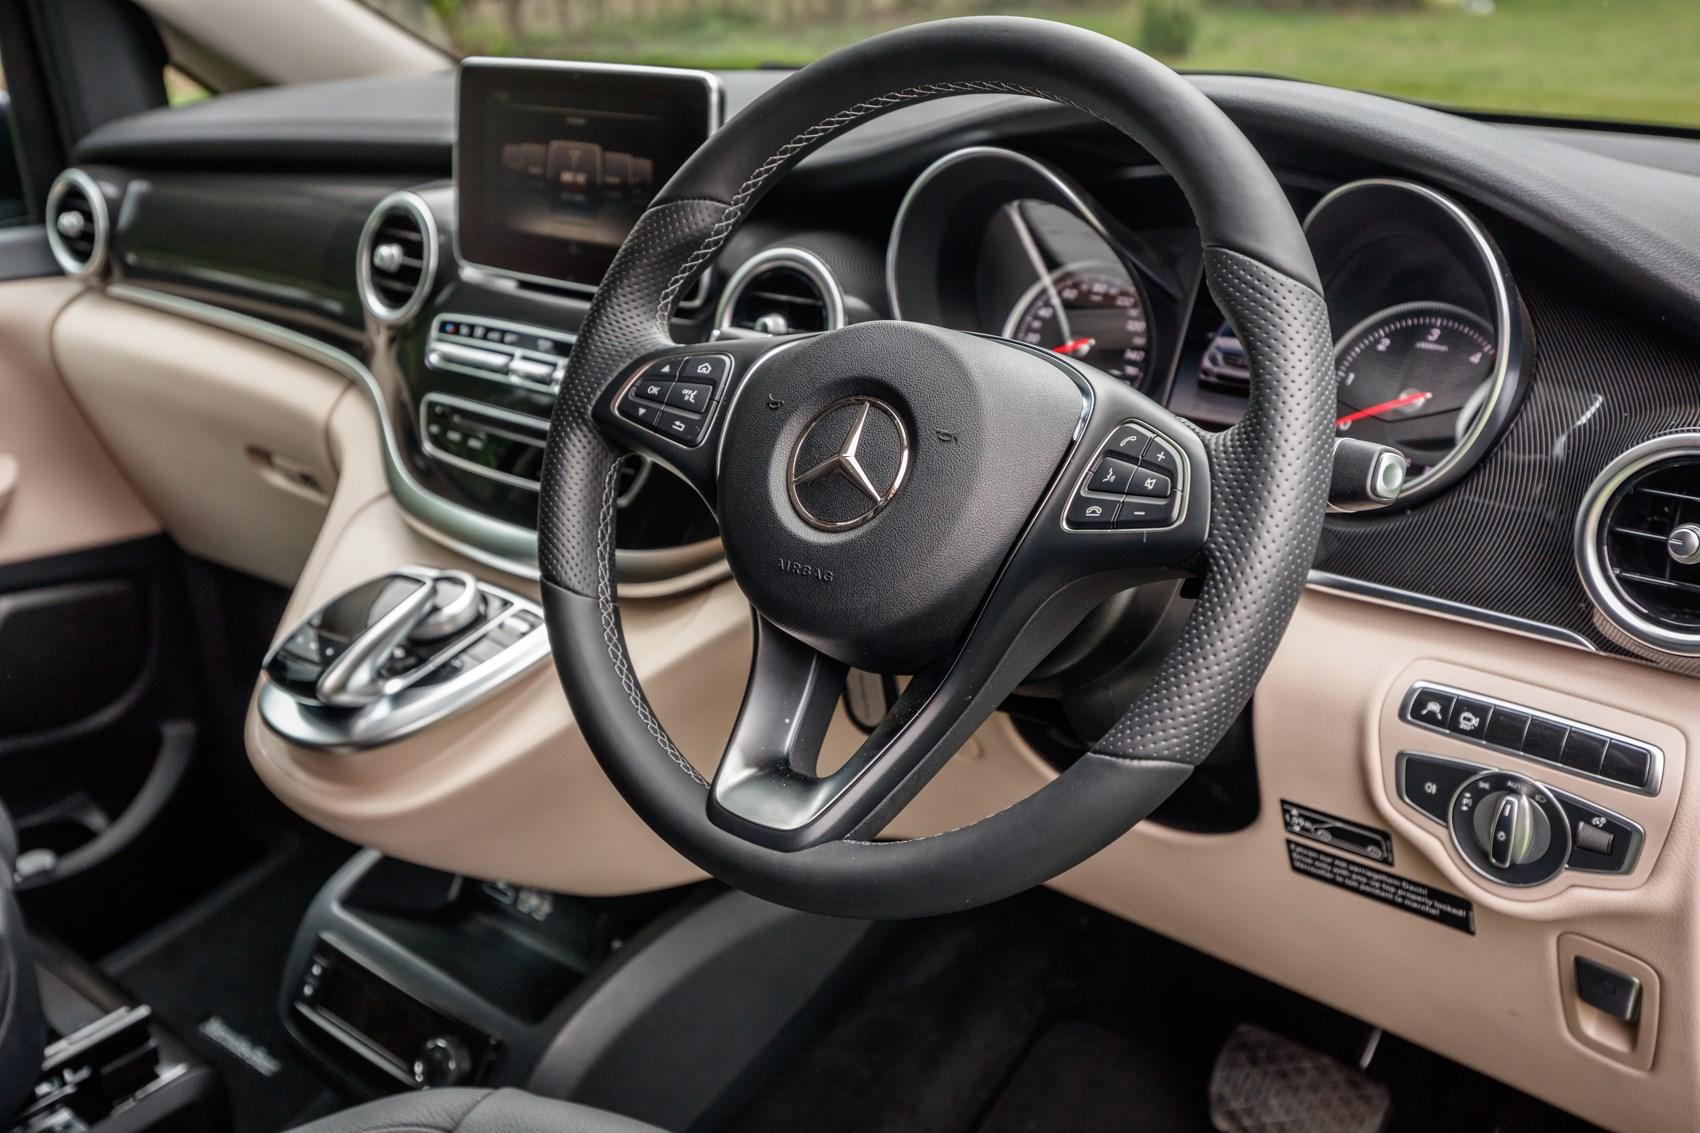 Mercedes benz v class marco polo 2017 features for Mercedes benz interior parts